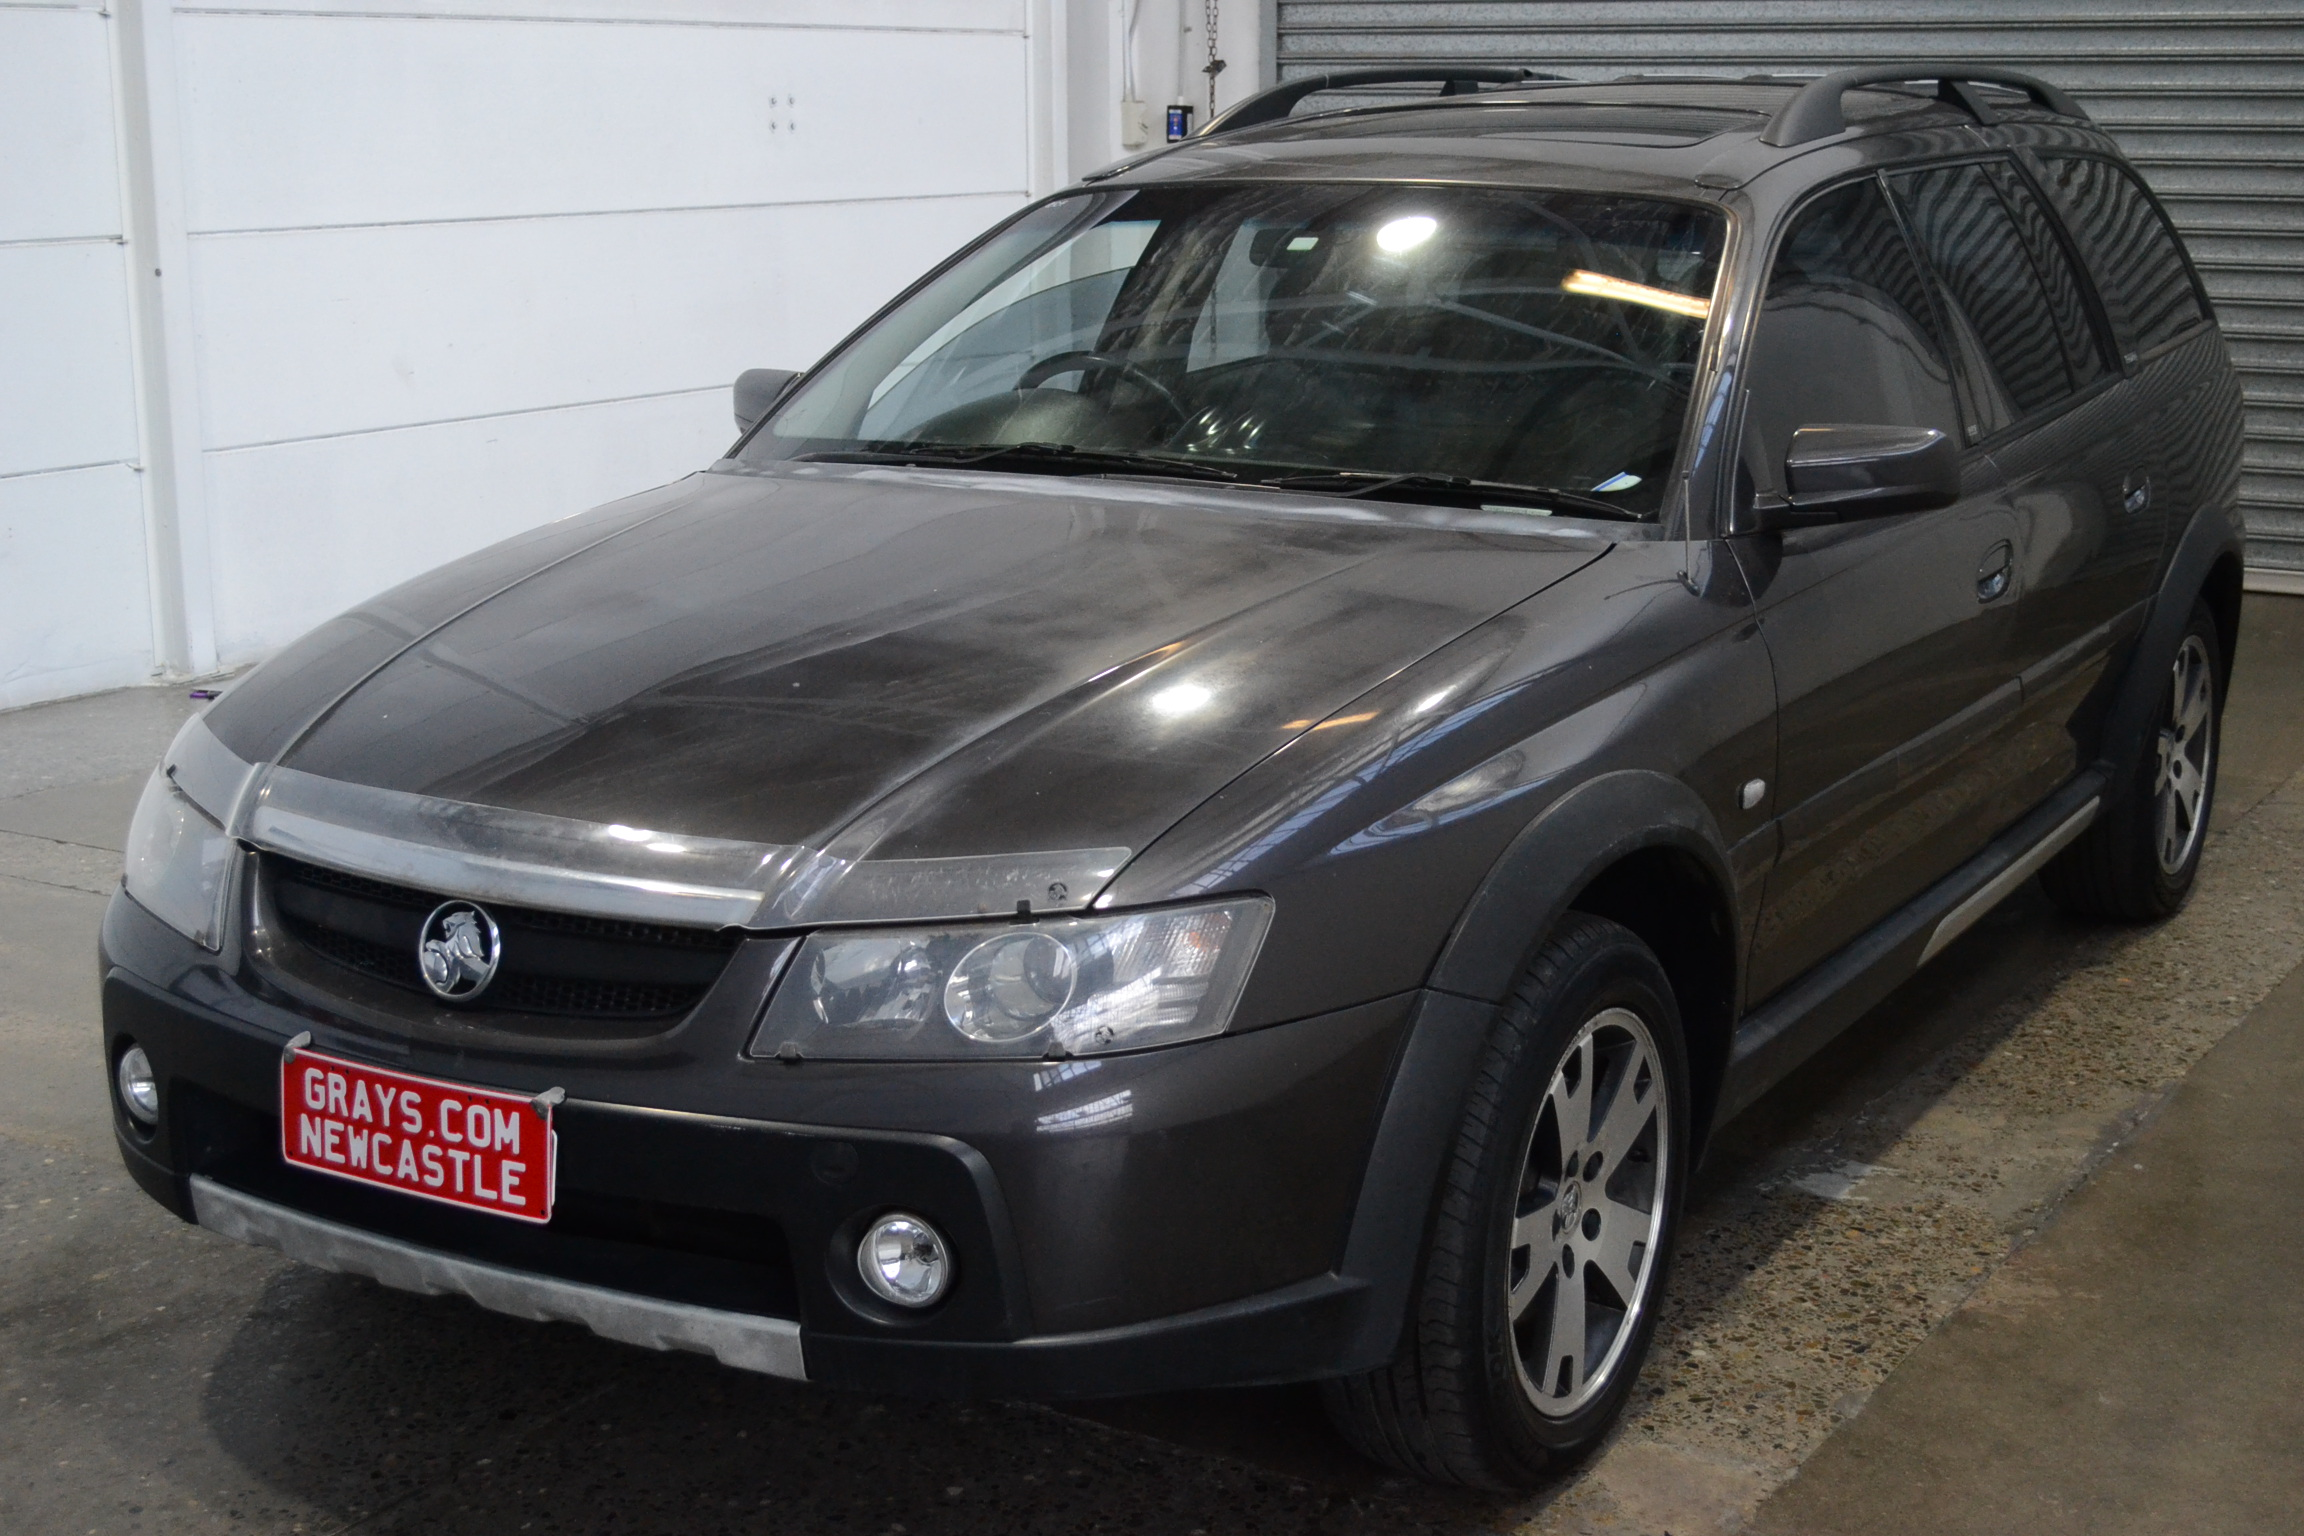 2006 Holden Adventra LX6 VZ Automatic Wagon (WOVR)